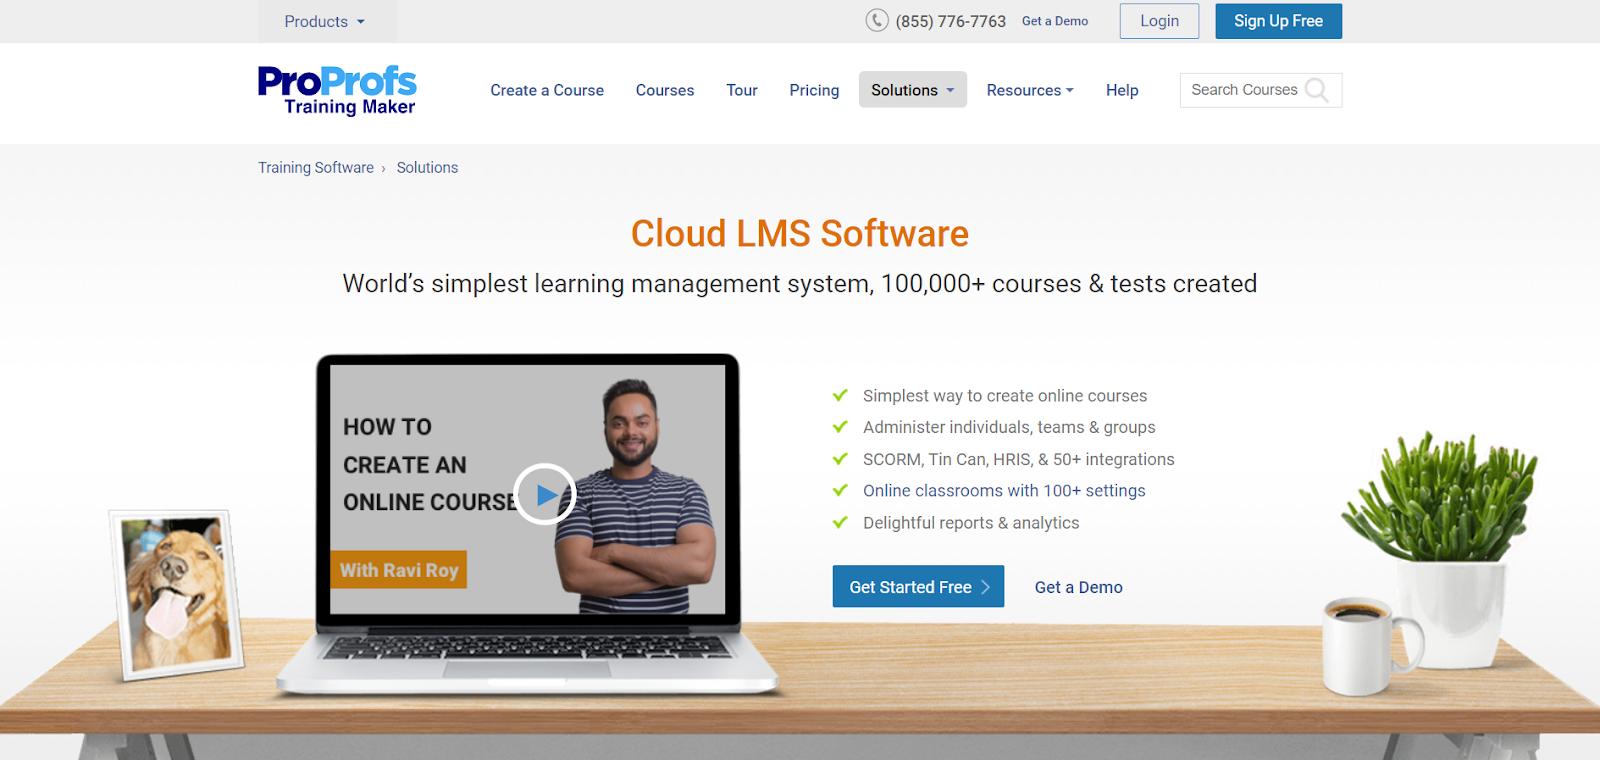 proprofs lms software